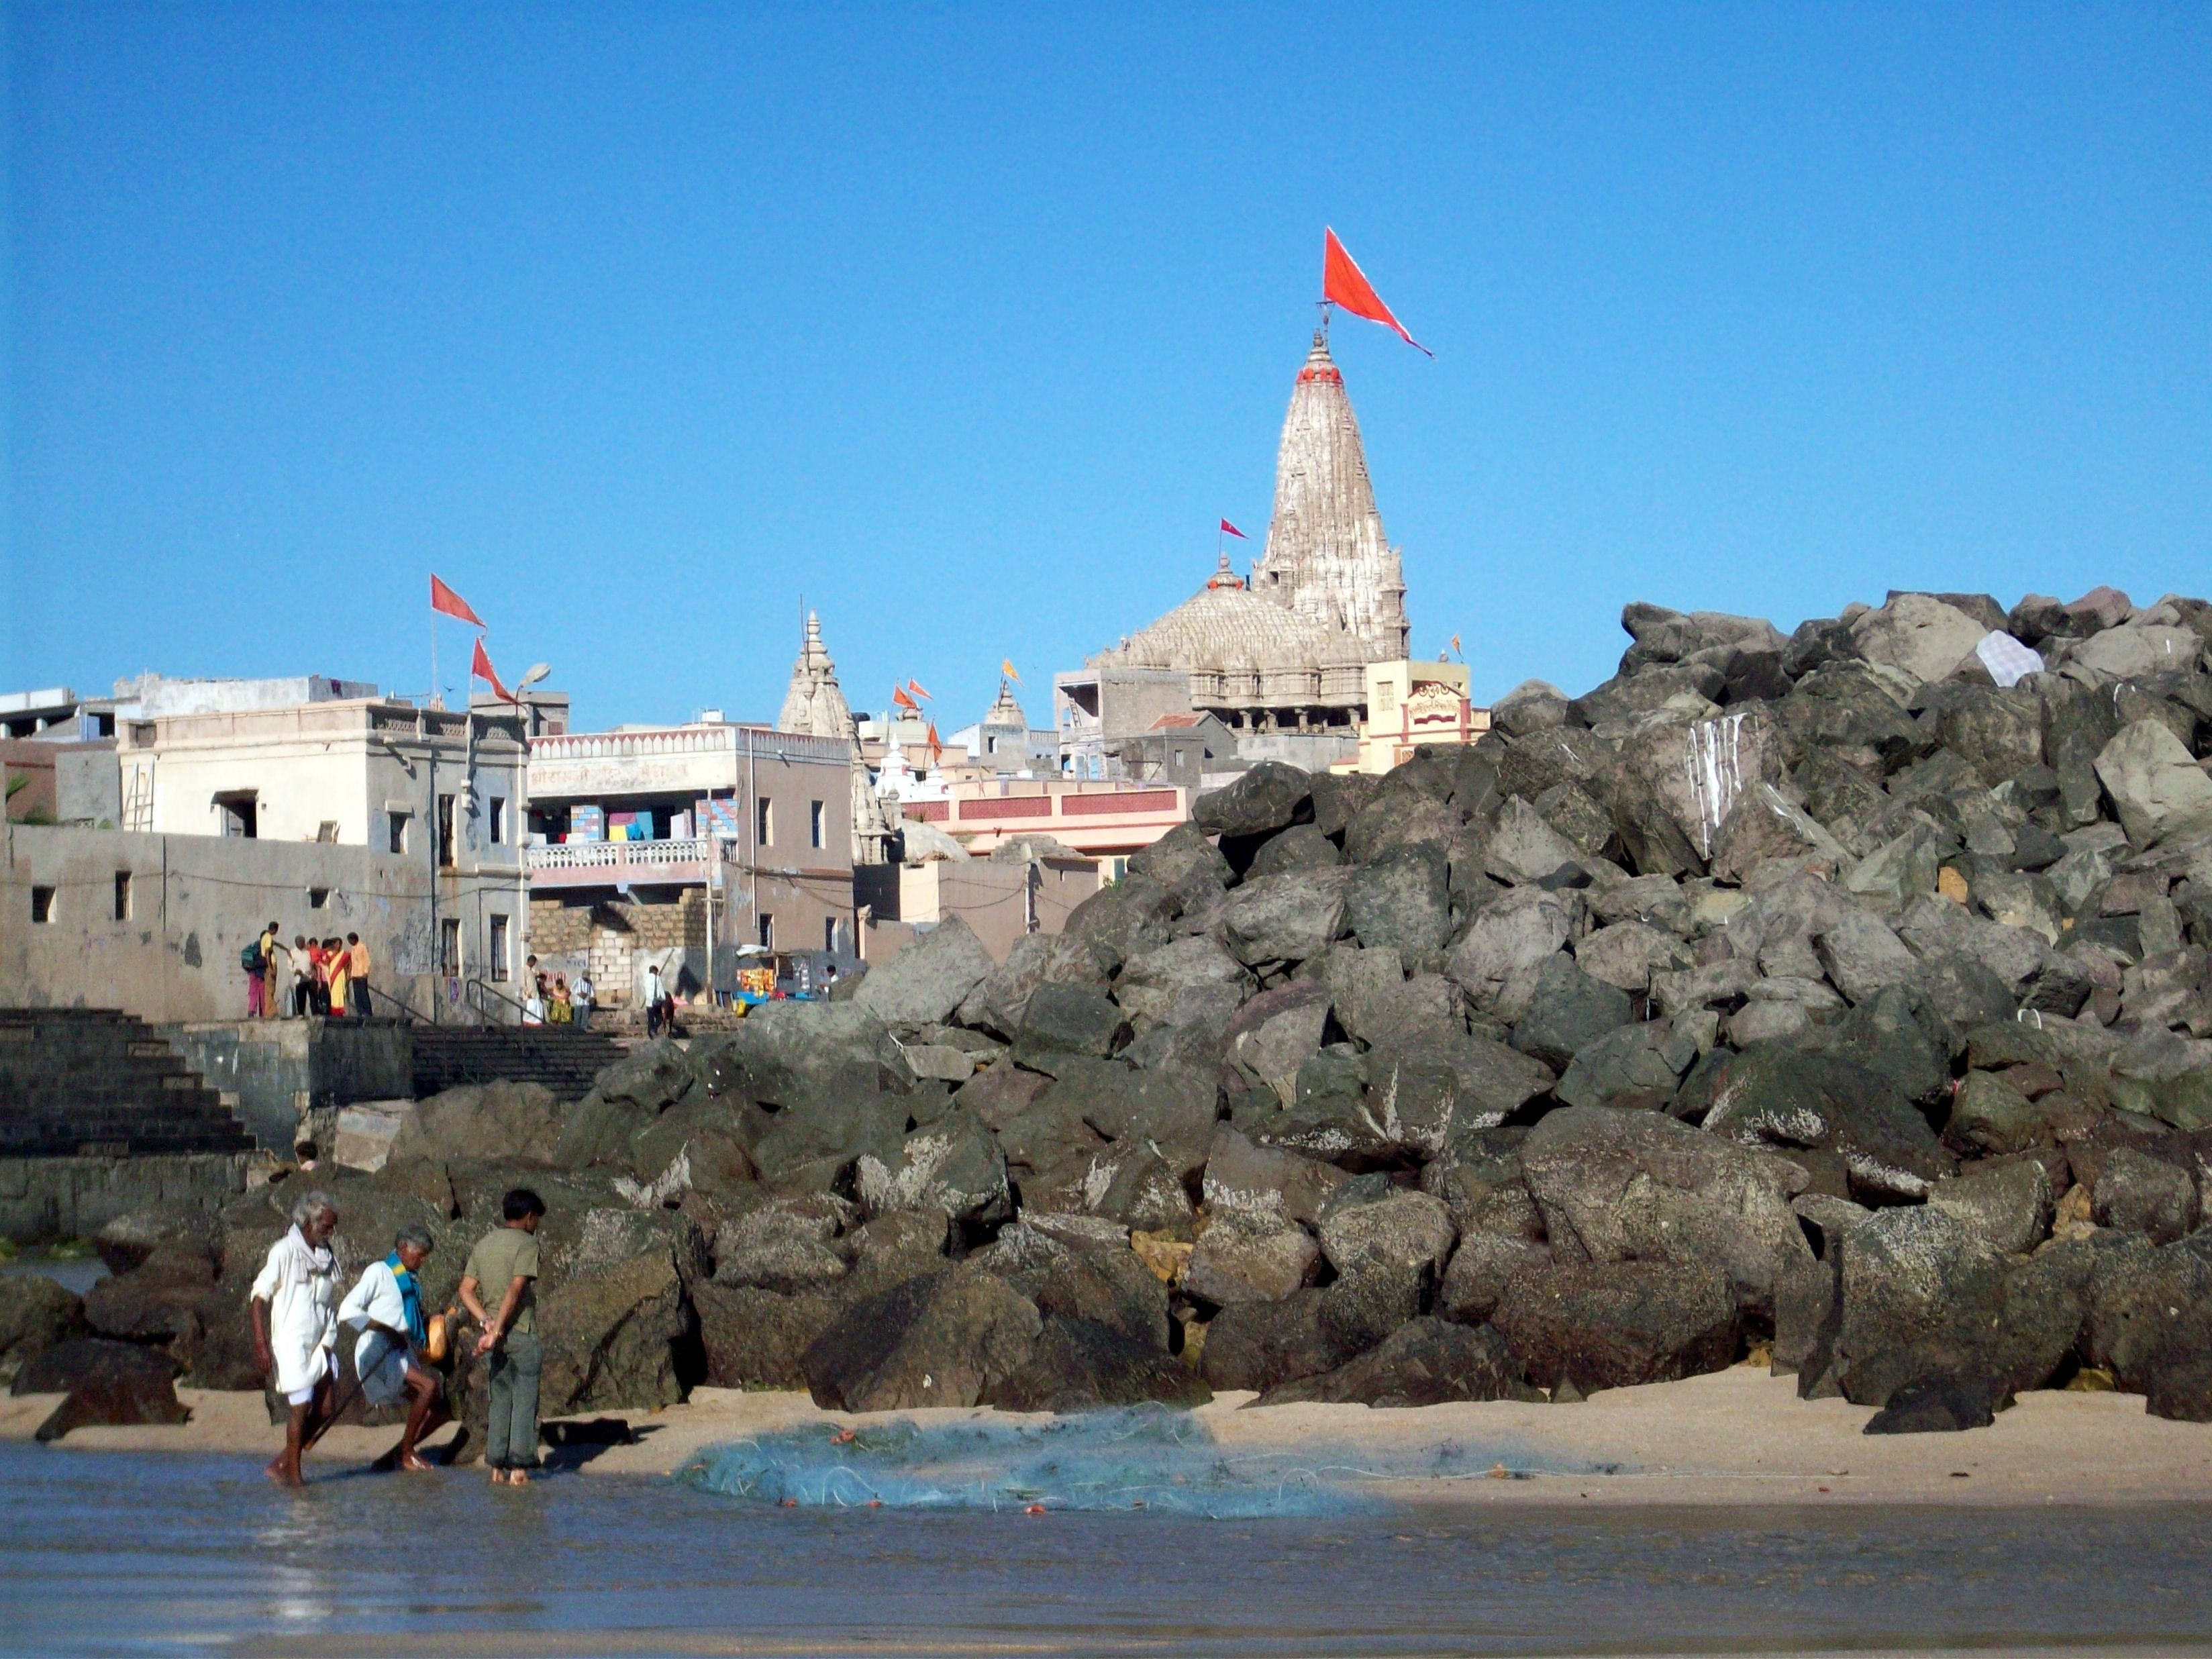 Dwarka fica na costa indiana (FOTO: WIKIMEDIA/SHISHIRDASIKA)